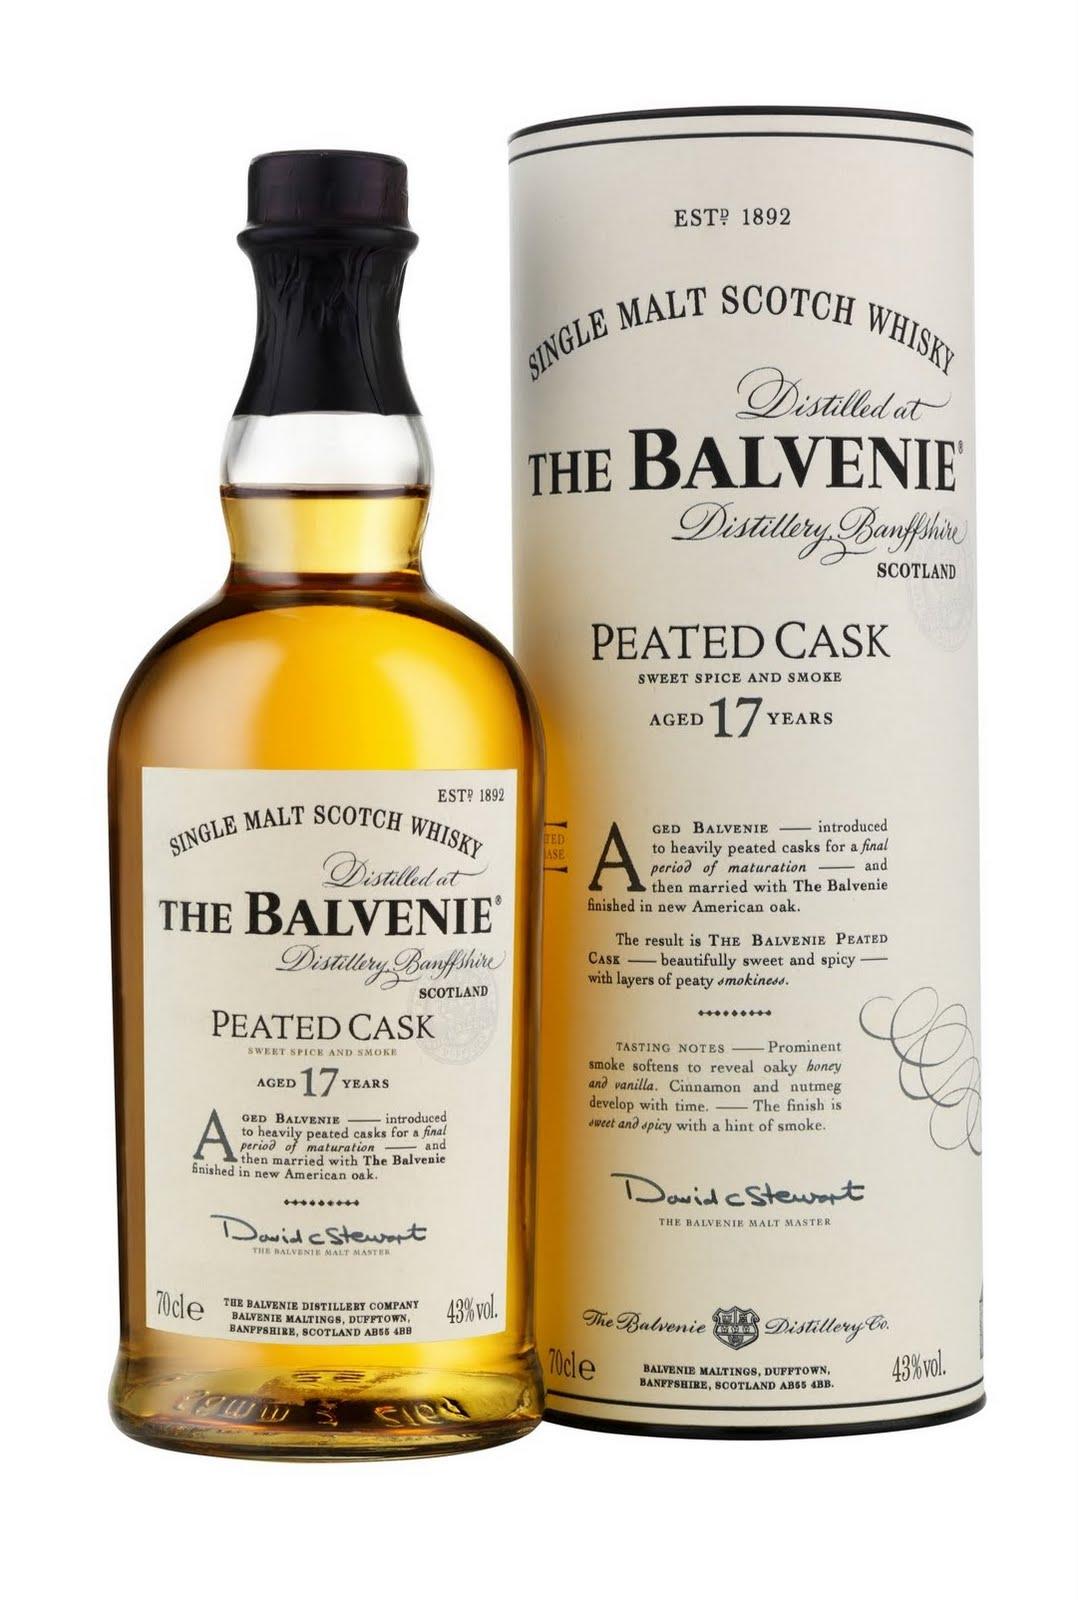 Balvenie Peated Cask